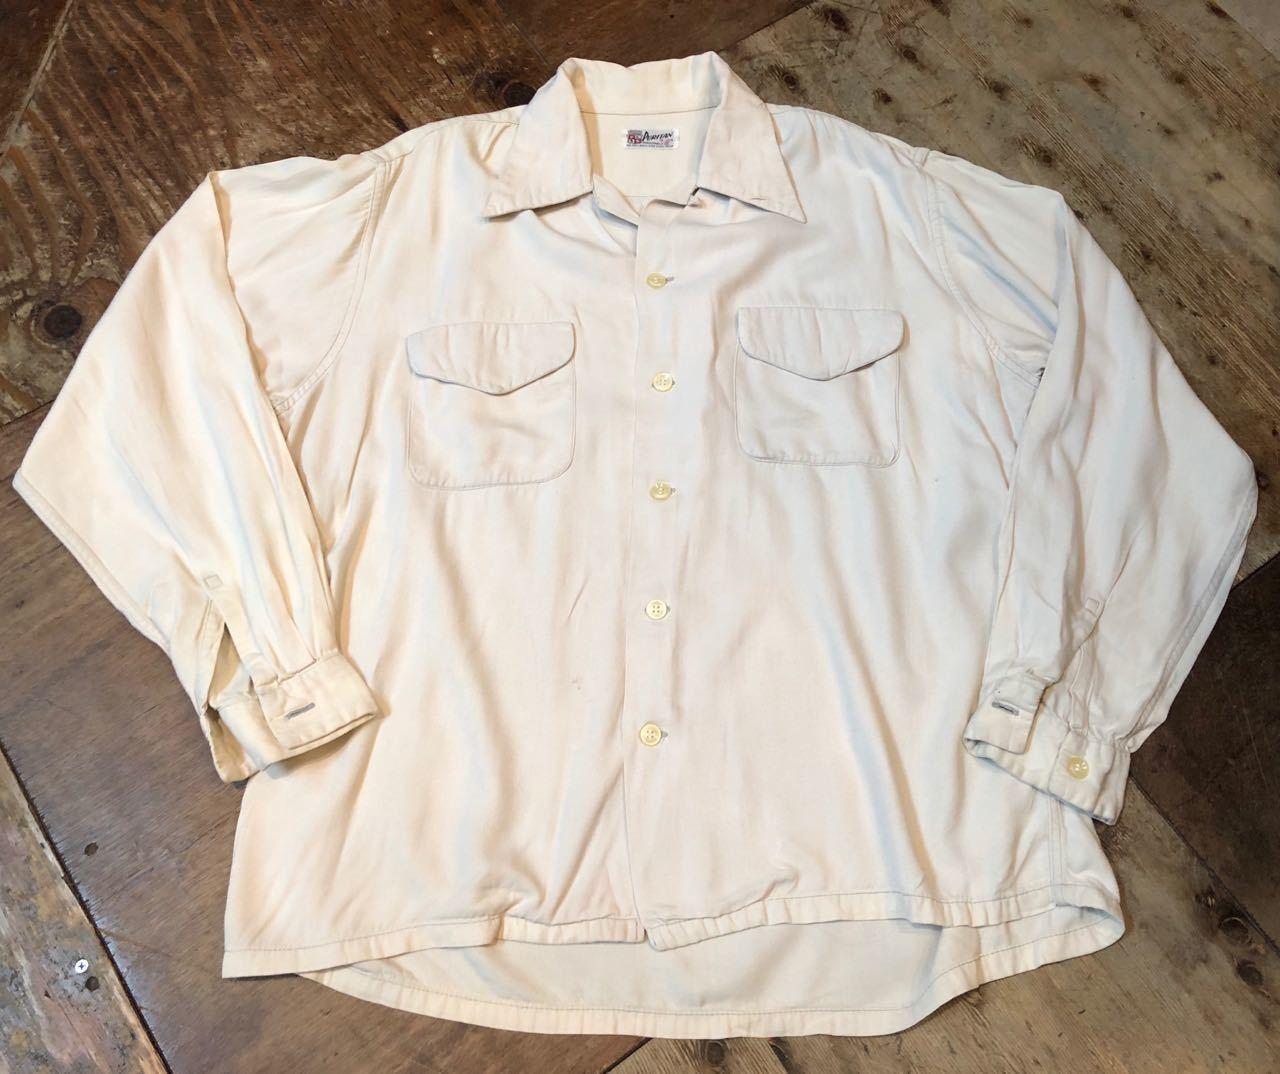 4月13日(土)入荷! 50s PURITAN Gabardine shirts  !_c0144020_13563844.jpg